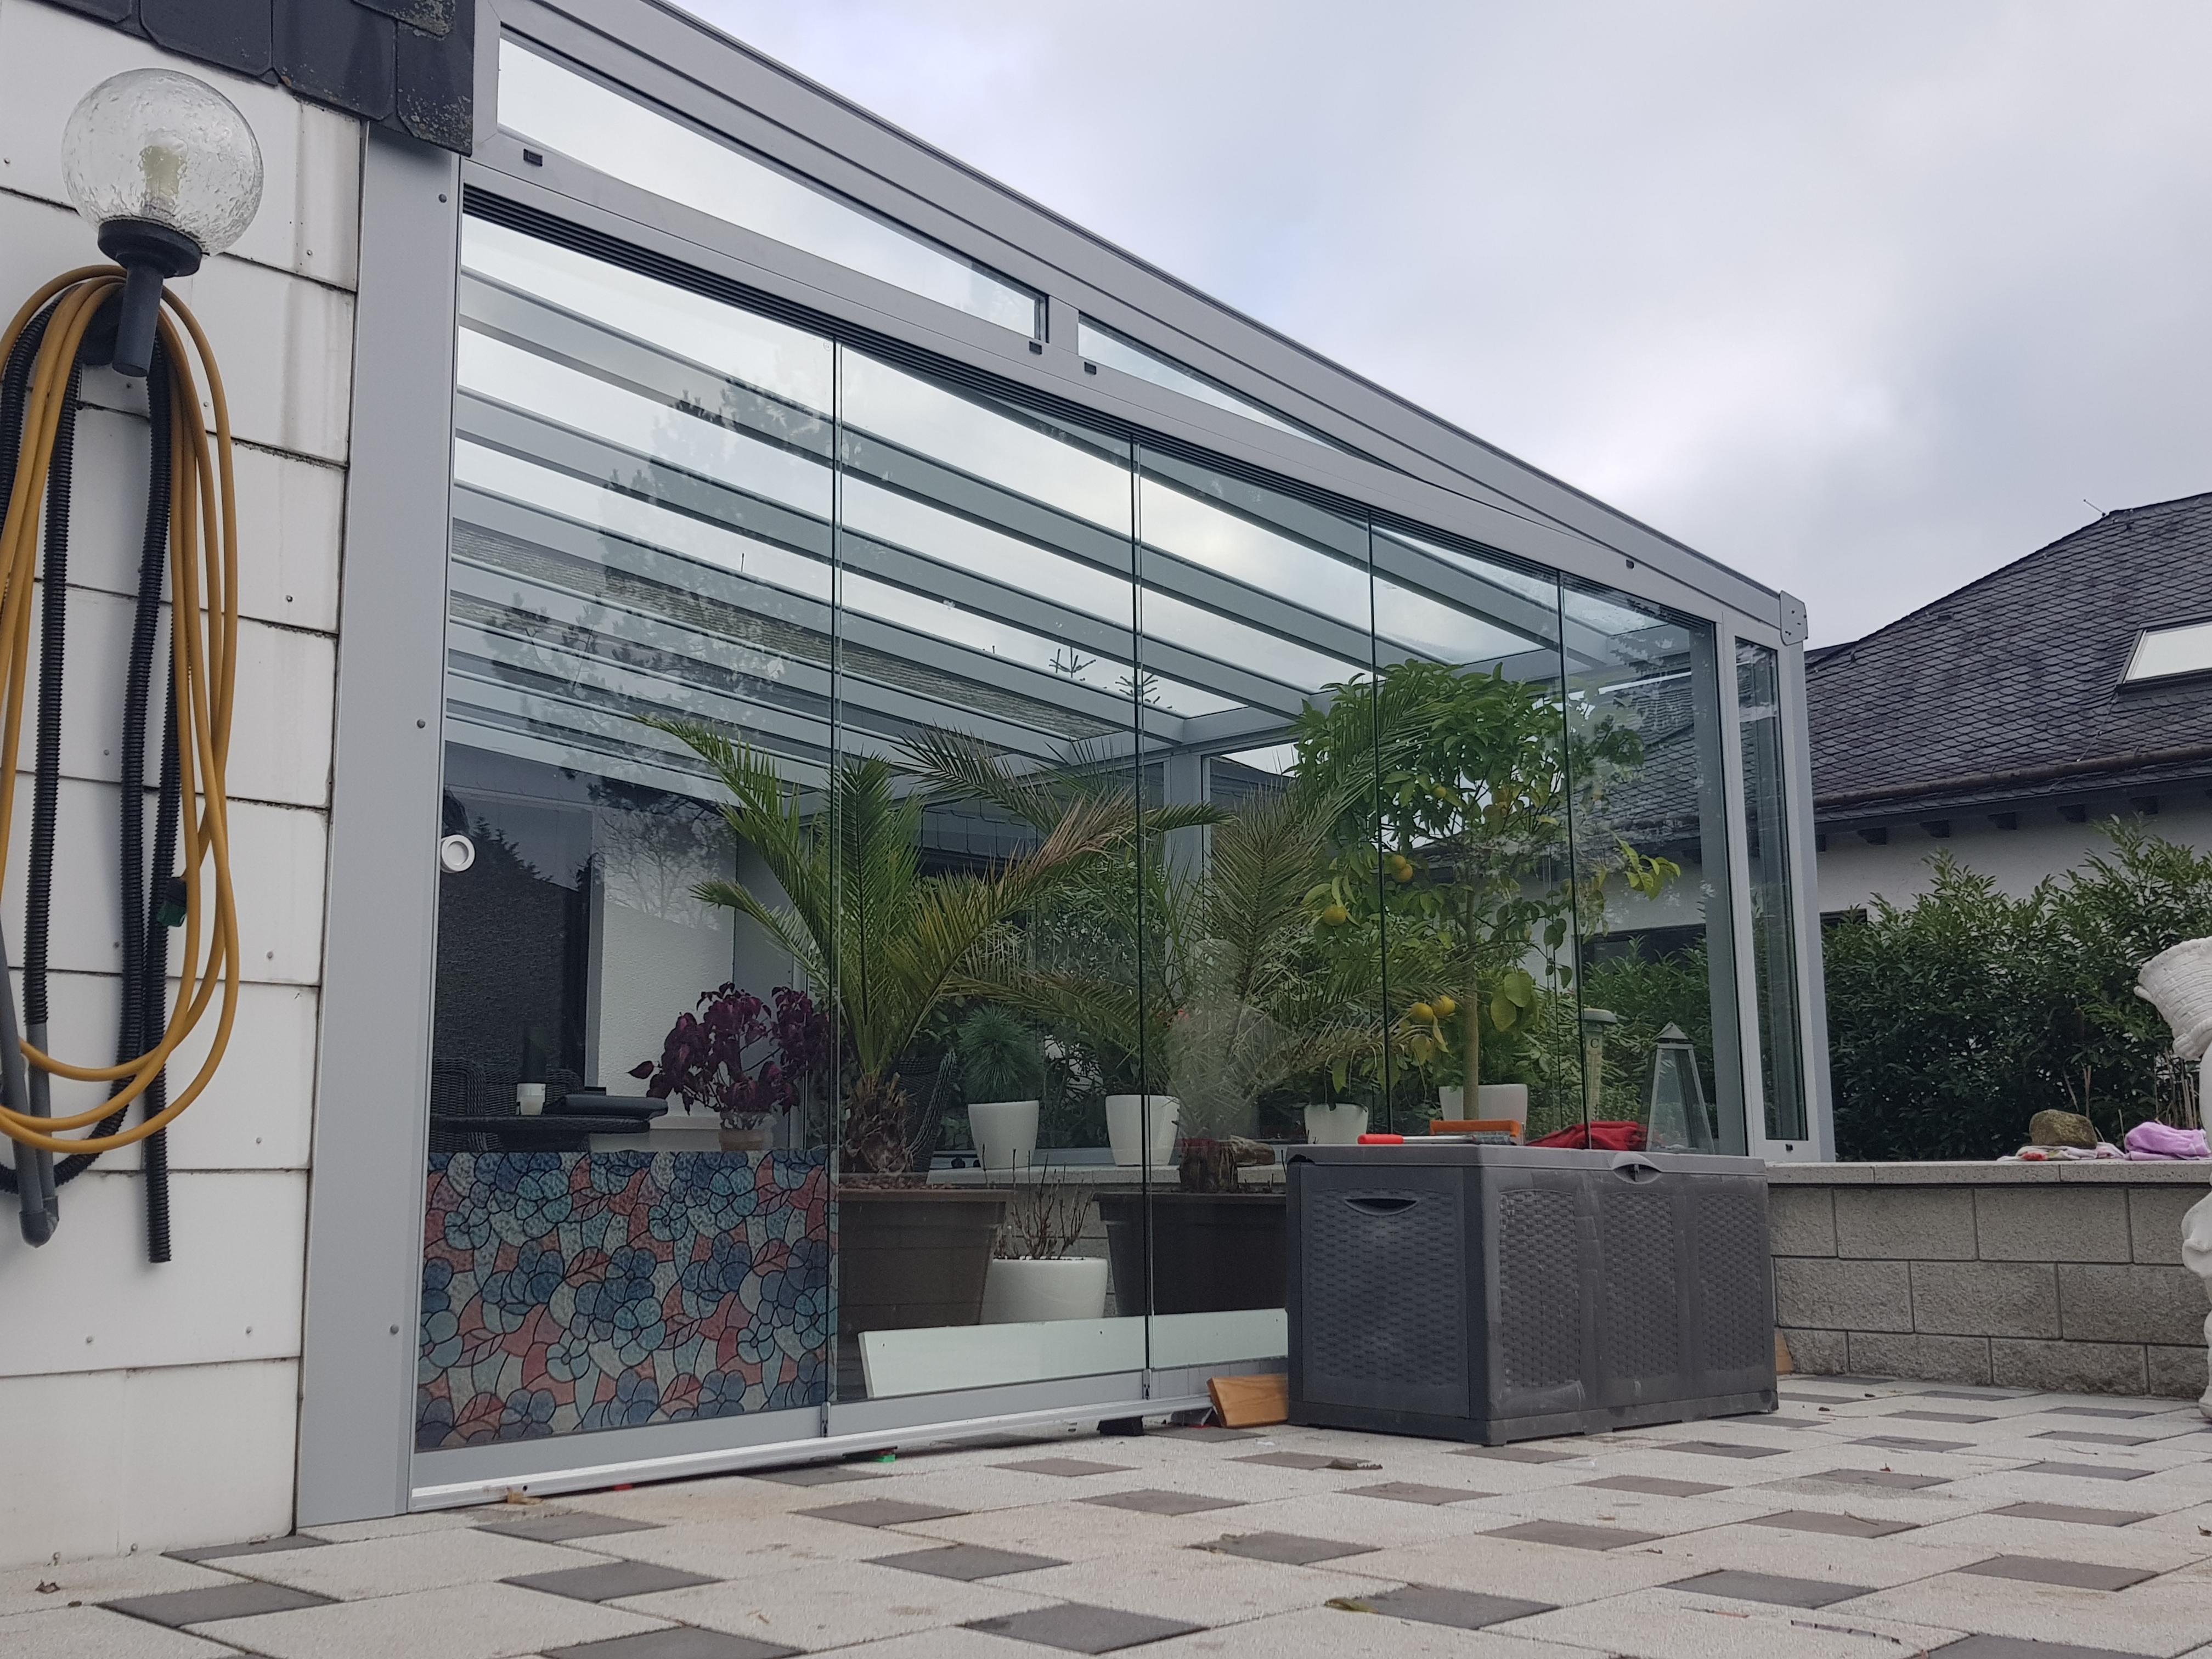 Wintergarten-Solution Satzkowsk (6)